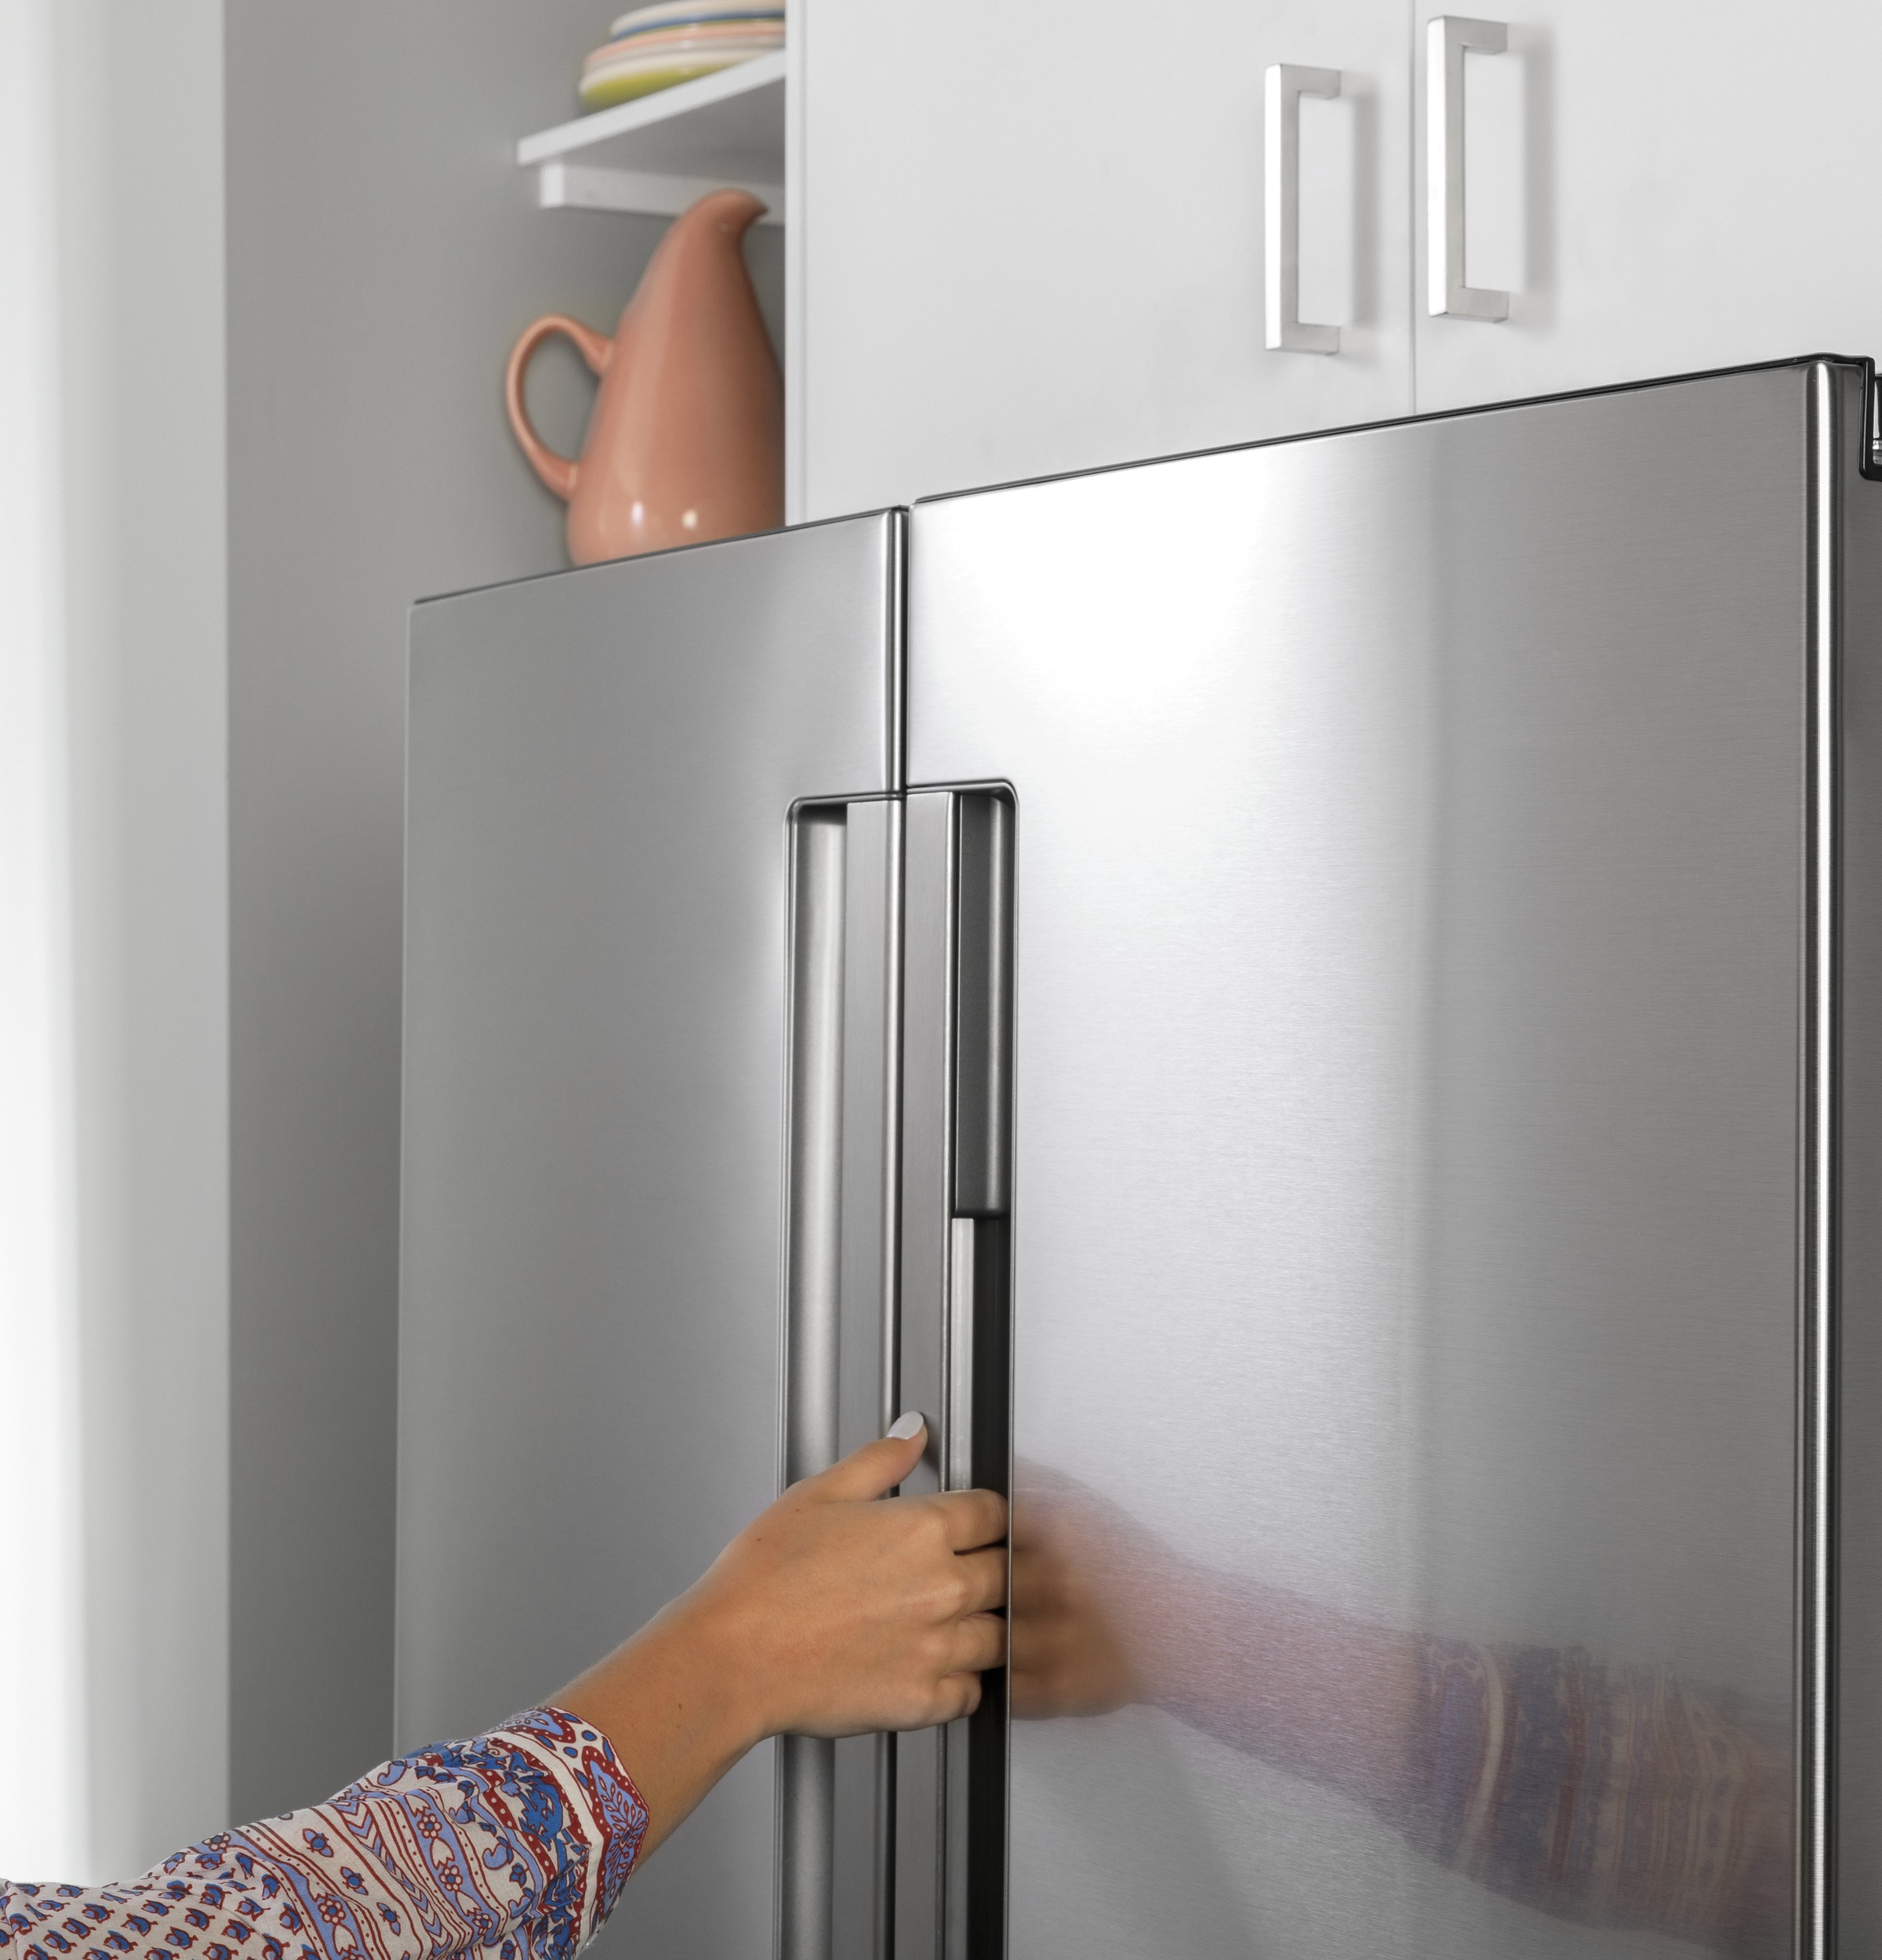 Model: QNE27JYMFS | Haier ENERGY STAR® 27.0 Cu. Ft. Fingerprint Resistant French-Door Refrigerator